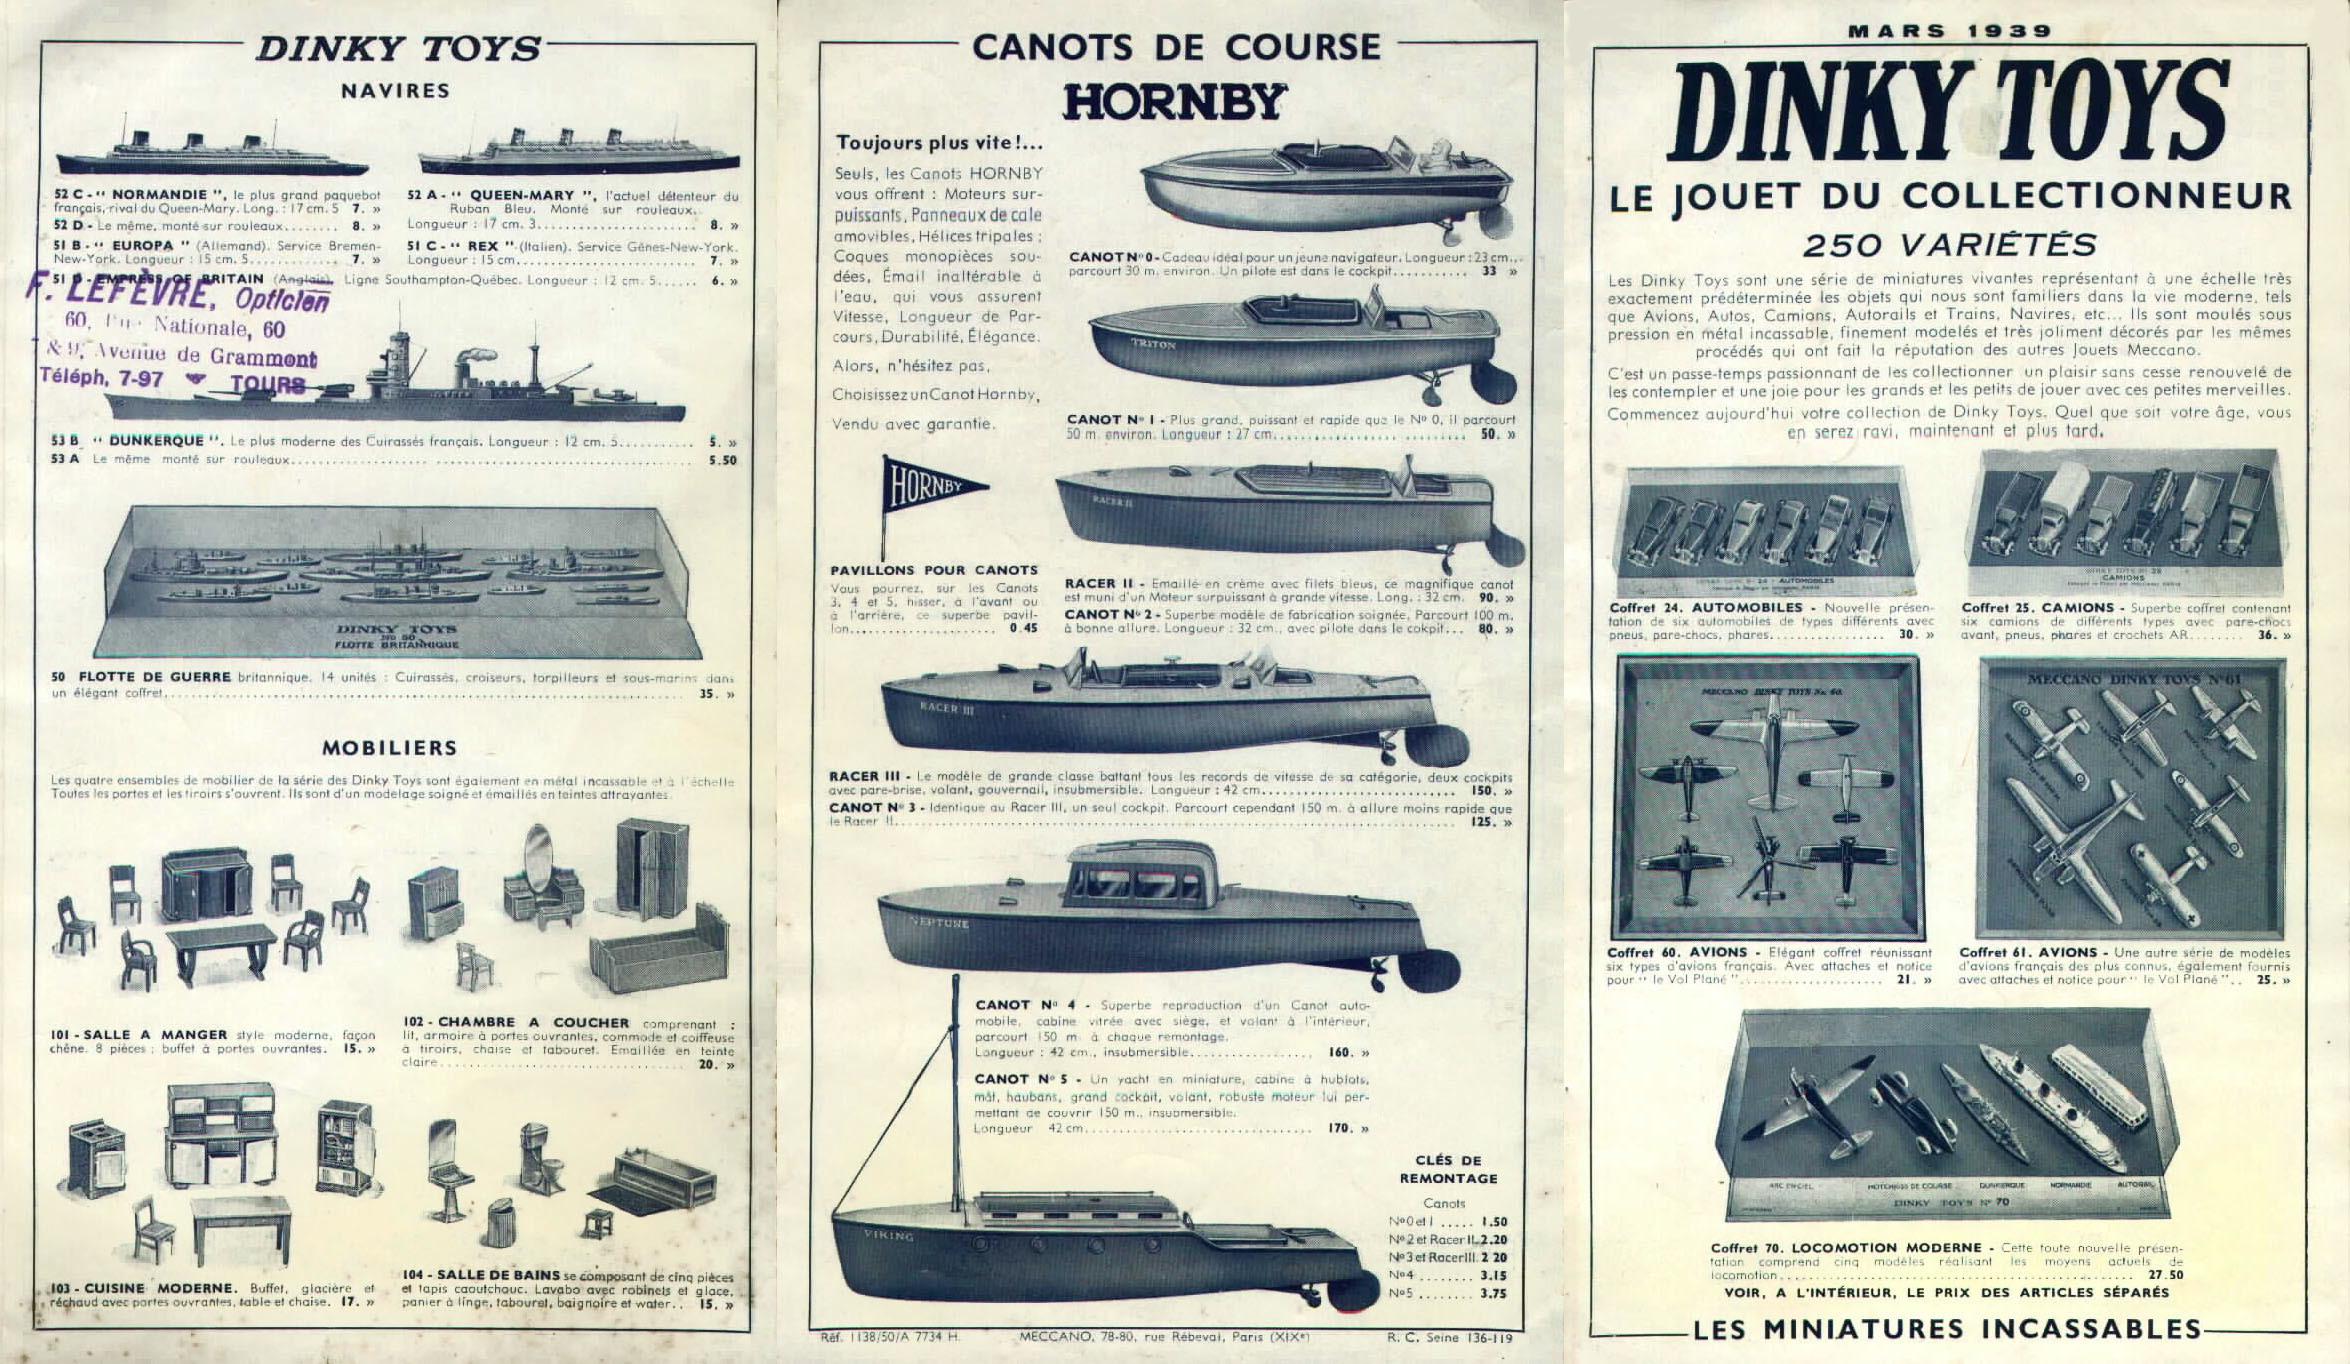 dinky_toys_catalog_1939_brochures_and_catalogs_605fa677-6f36-4f3a-a7a8-5966e4485025.jpg